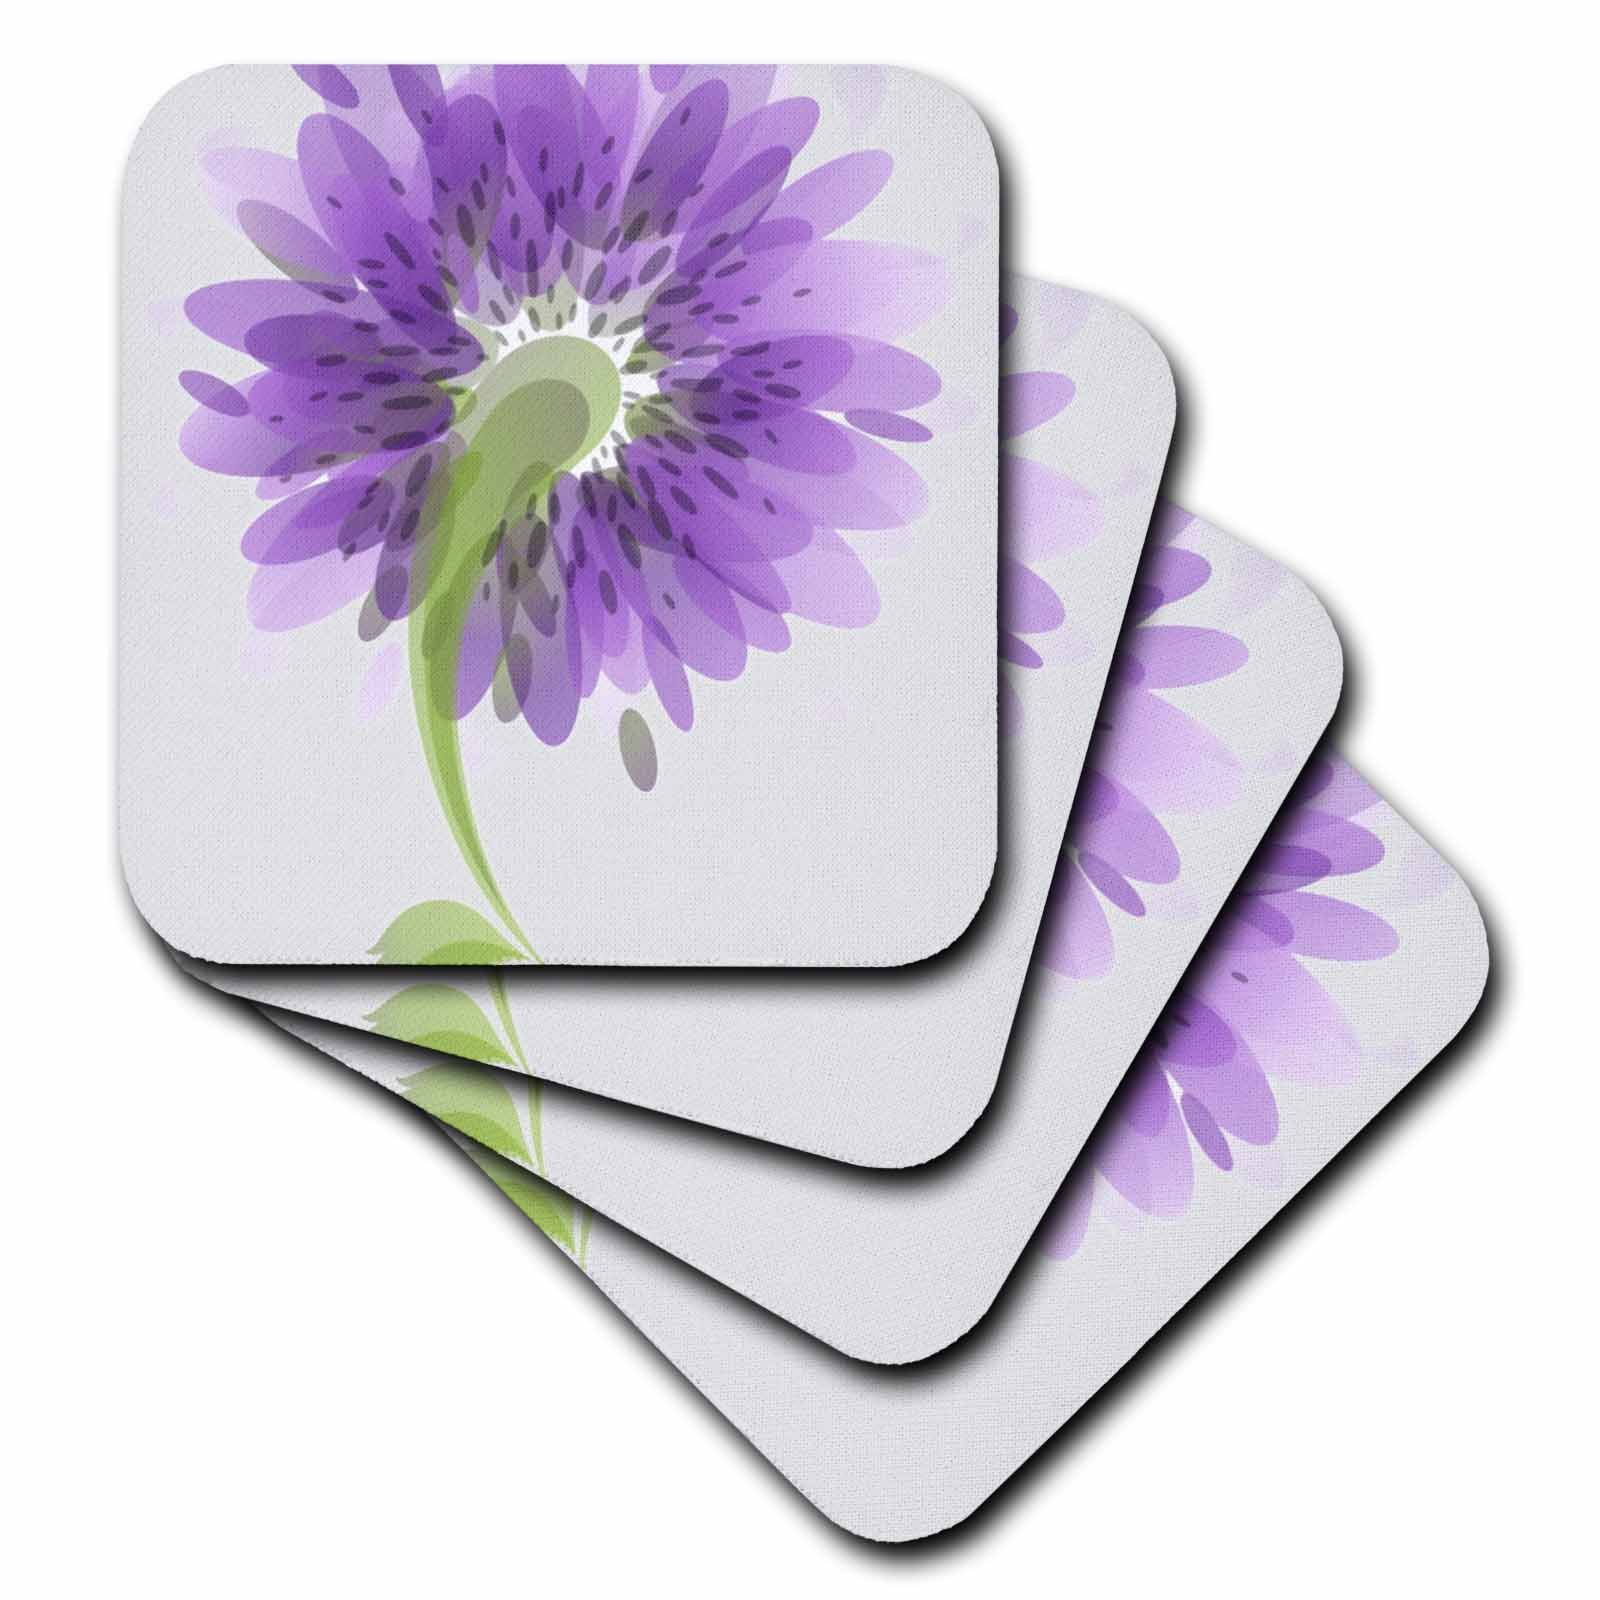 3dRose cst_23470_1 Purple Watercolor Flowers-Soft Coasters, Set of 4